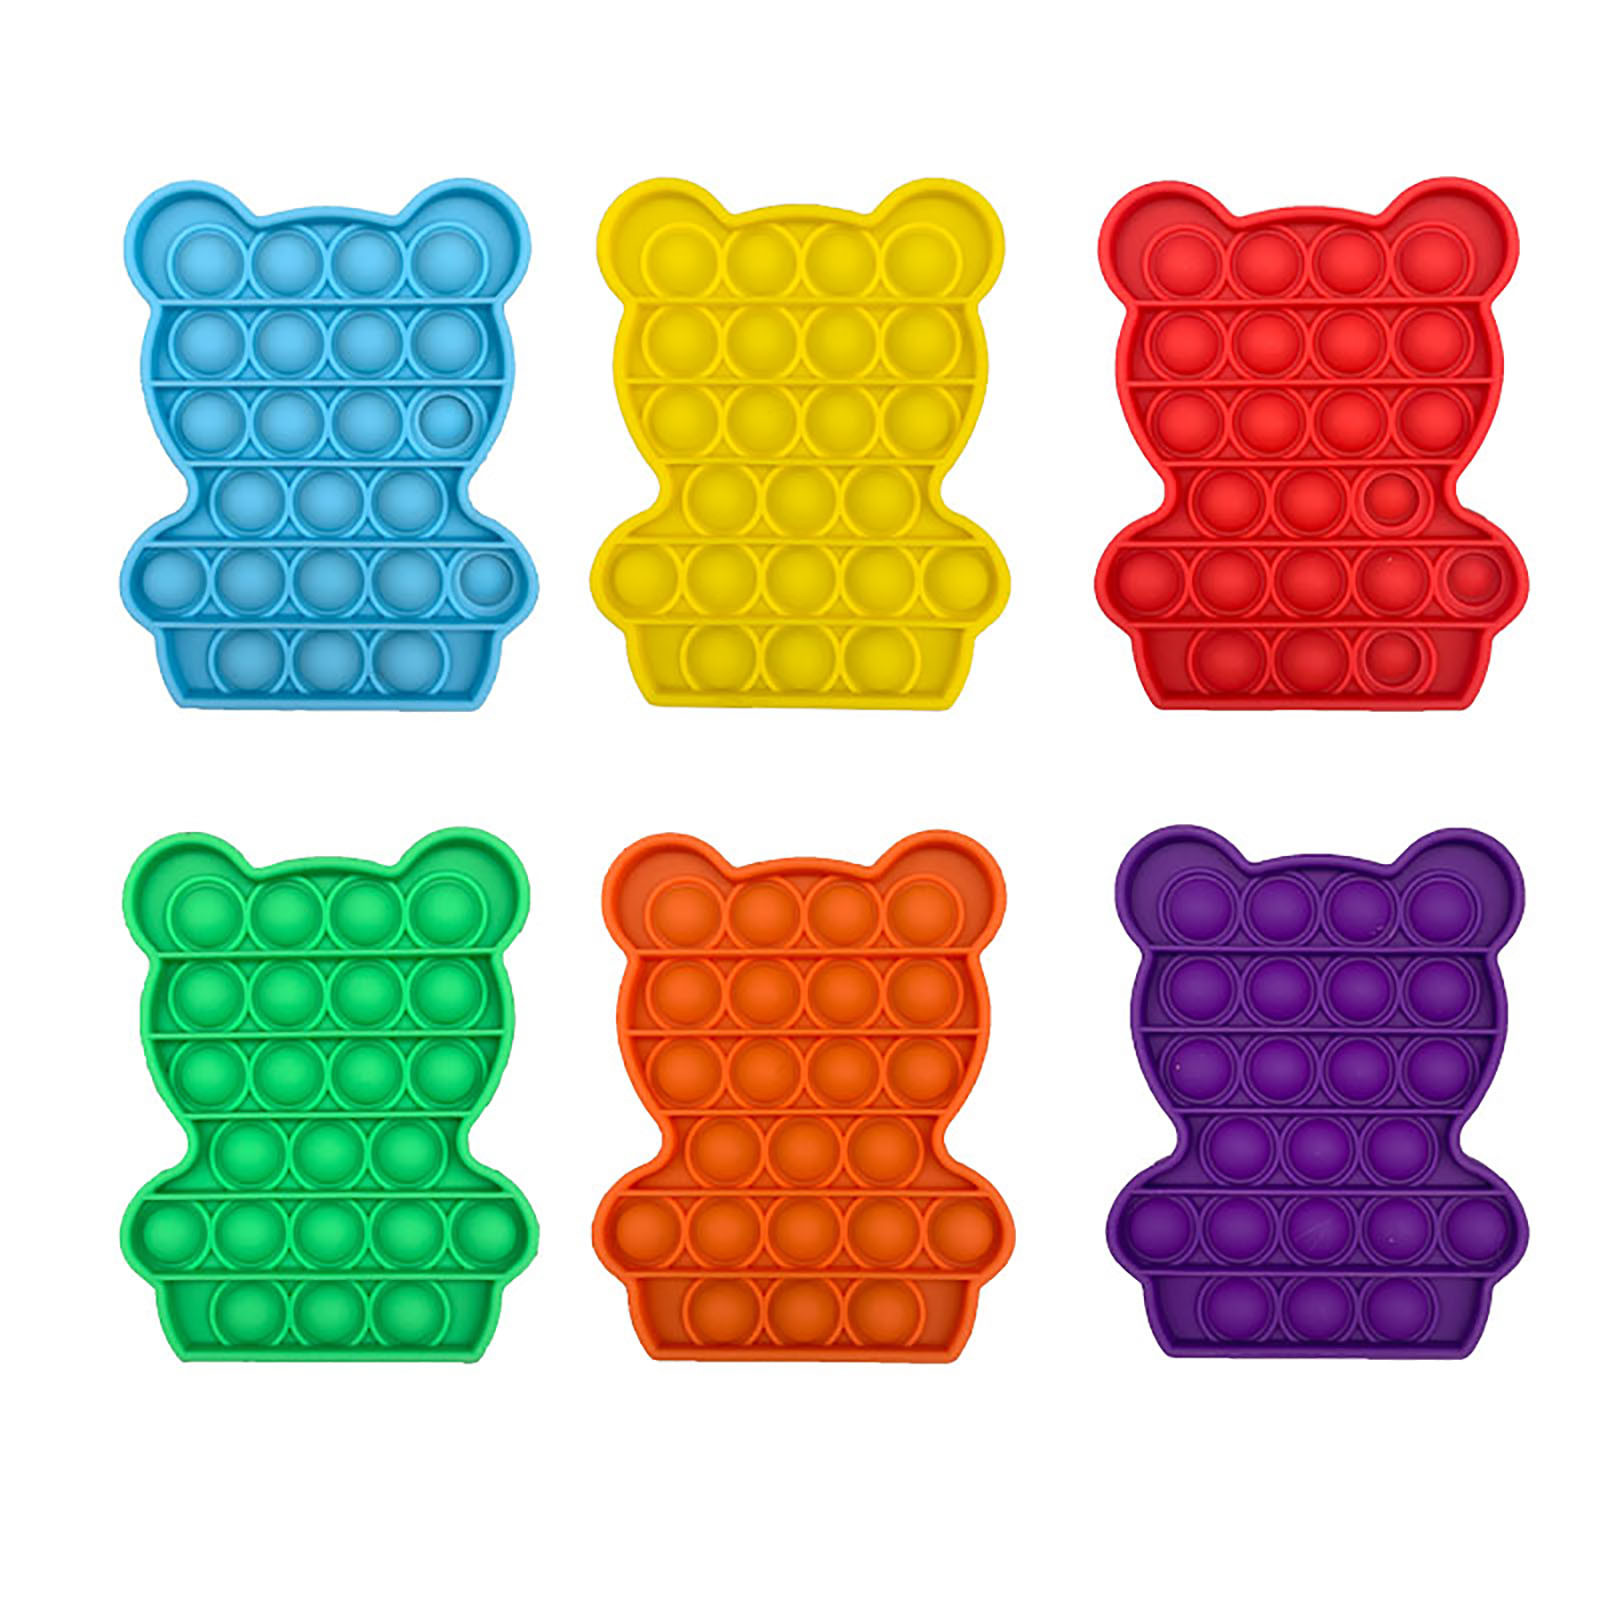 Toys Adult Needs Pops-It-Fidget Anti-Stress Push-Pops Bubble-Sensory-Toy Funny Squishy img5